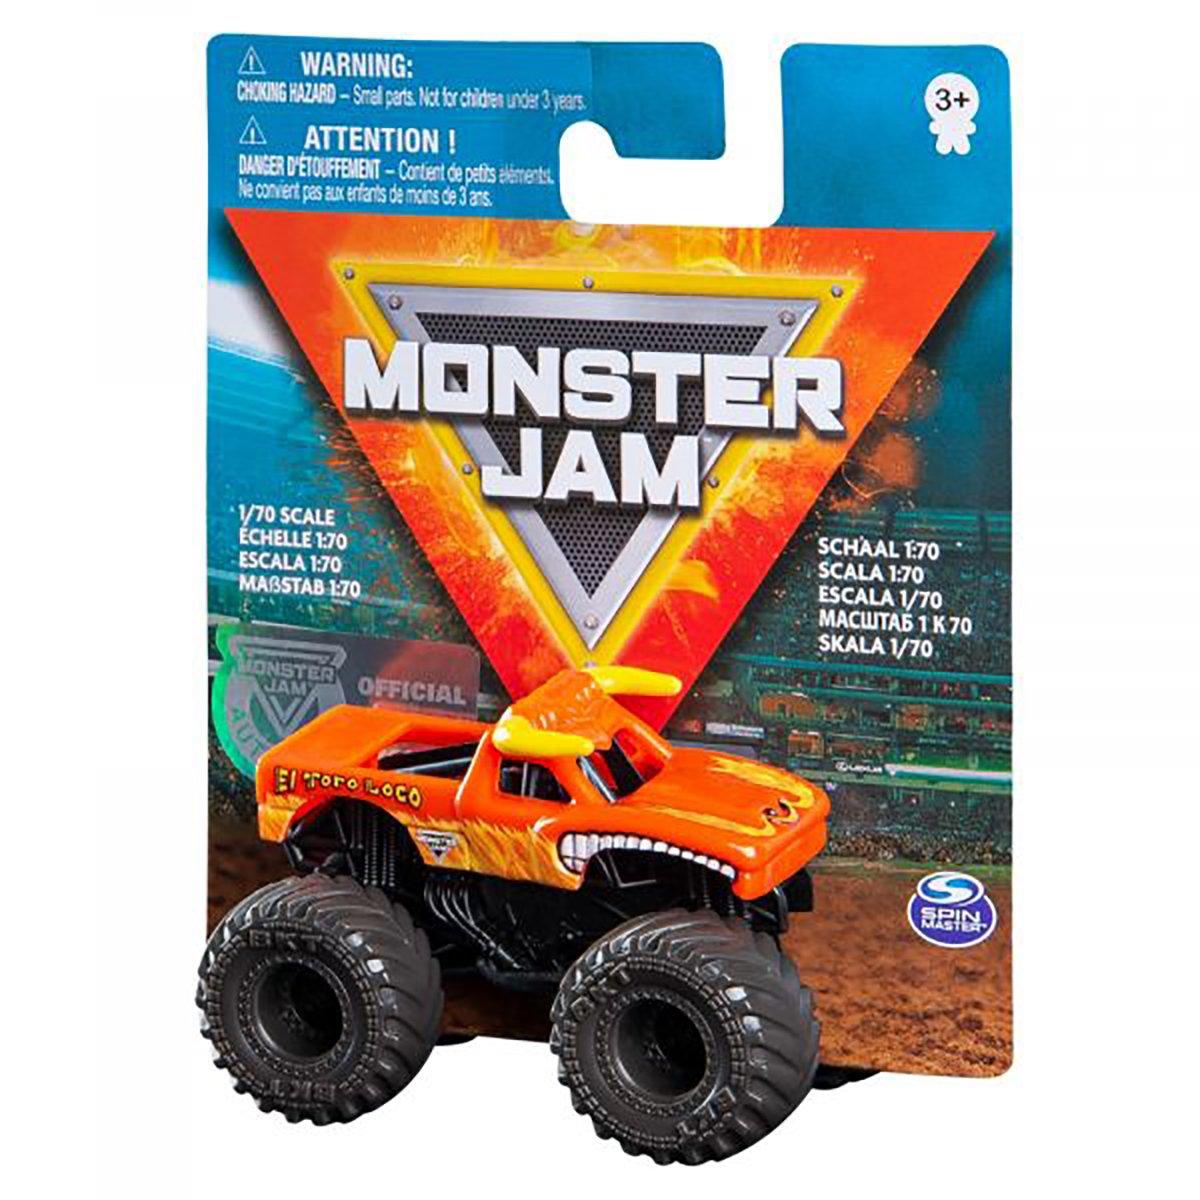 Masinuta Monster Jam 1:70, El Toro Loco, 20120612